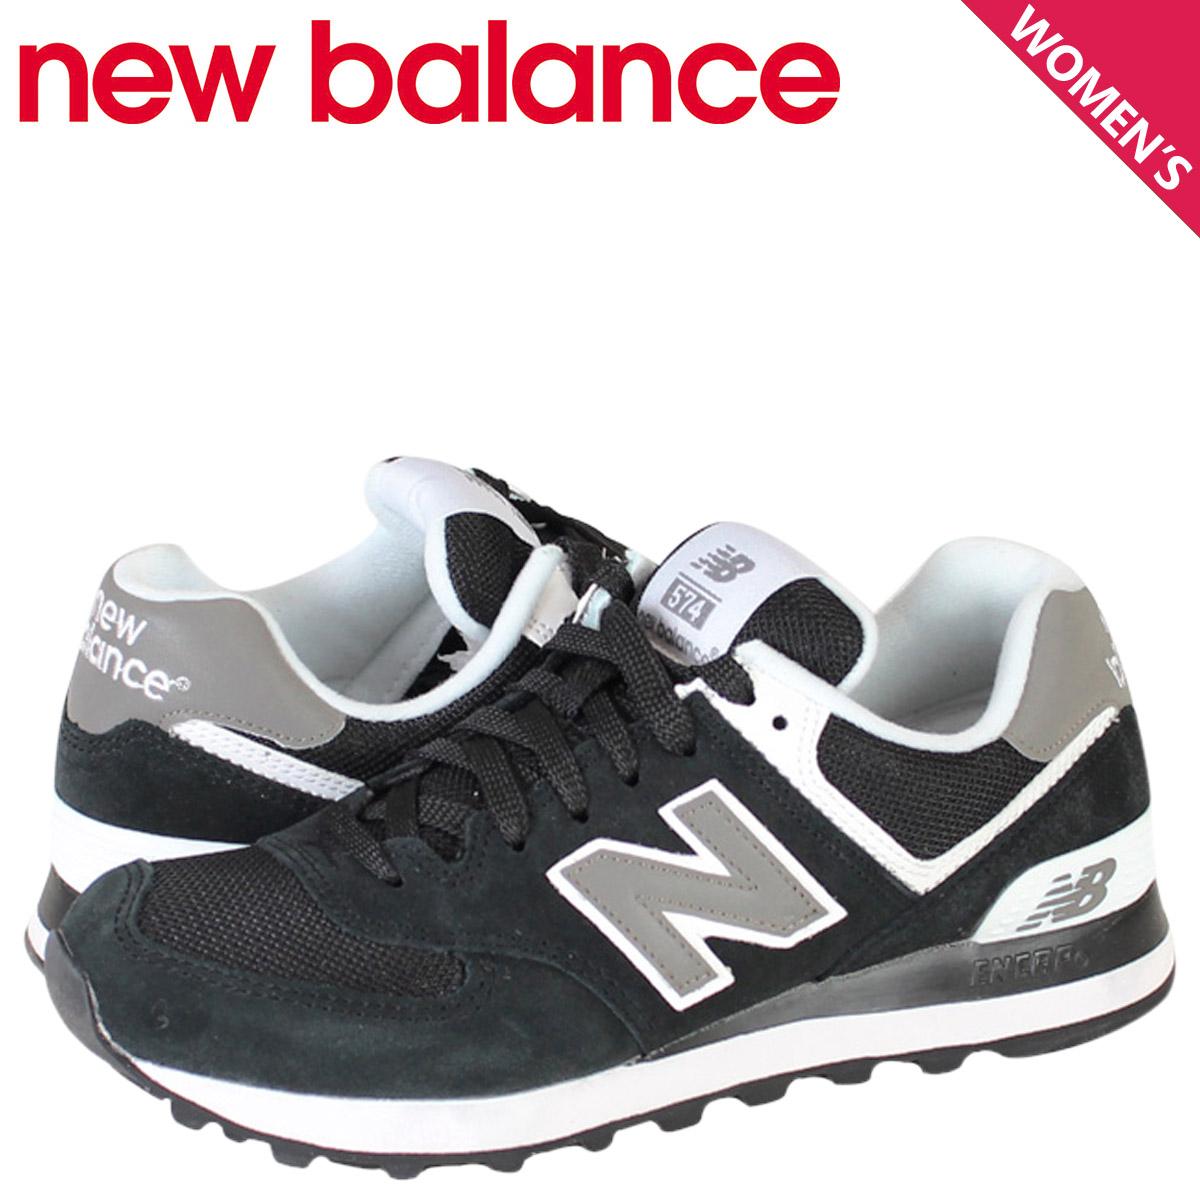 new balance 14